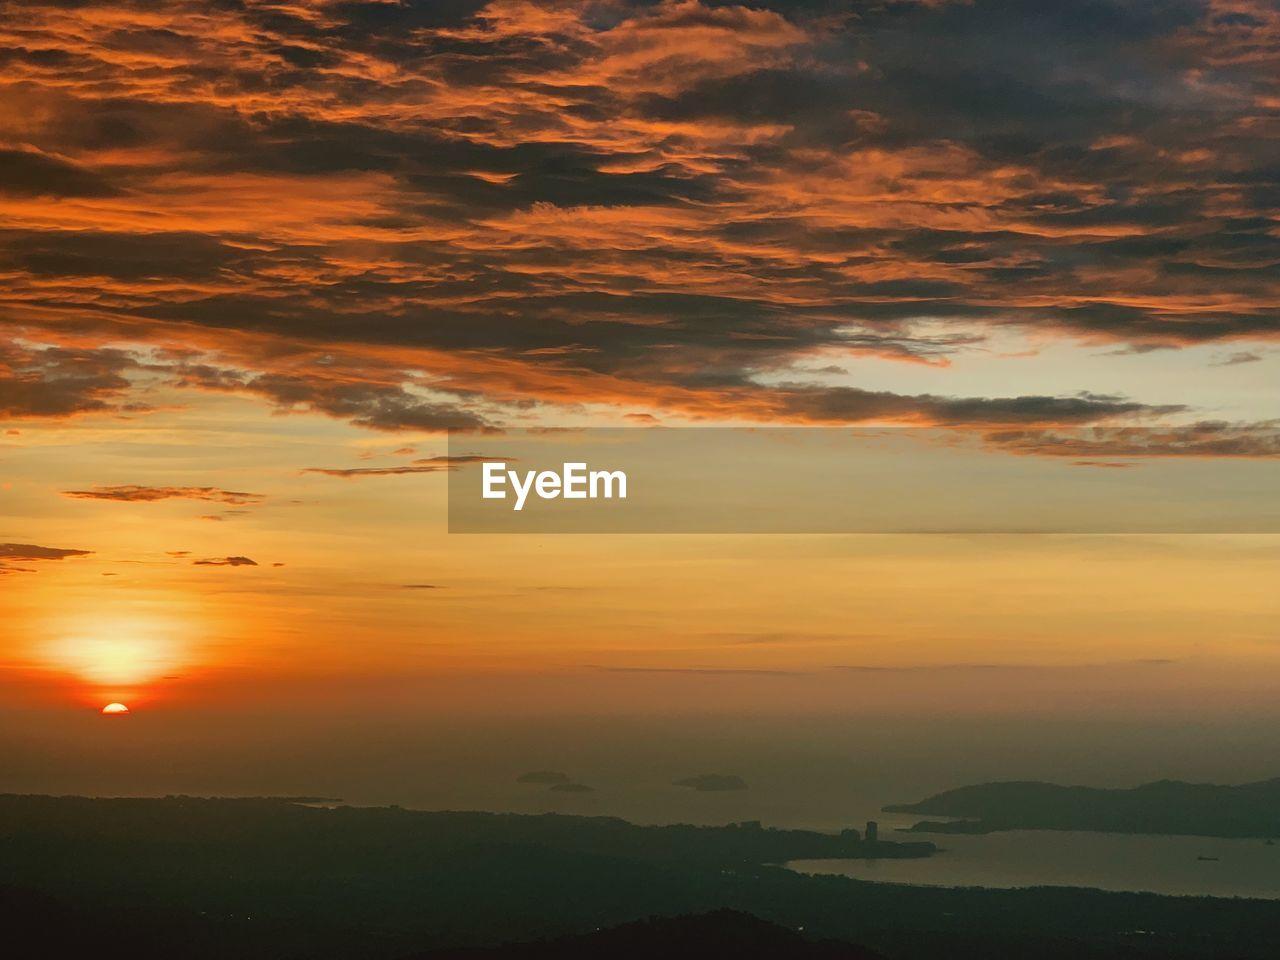 sunset, sky, beauty in nature, scenics - nature, cloud - sky, orange color, tranquil scene, tranquility, idyllic, environment, nature, no people, landscape, silhouette, non-urban scene, sun, dramatic sky, outdoors, sunlight, atmospheric mood, romantic sky